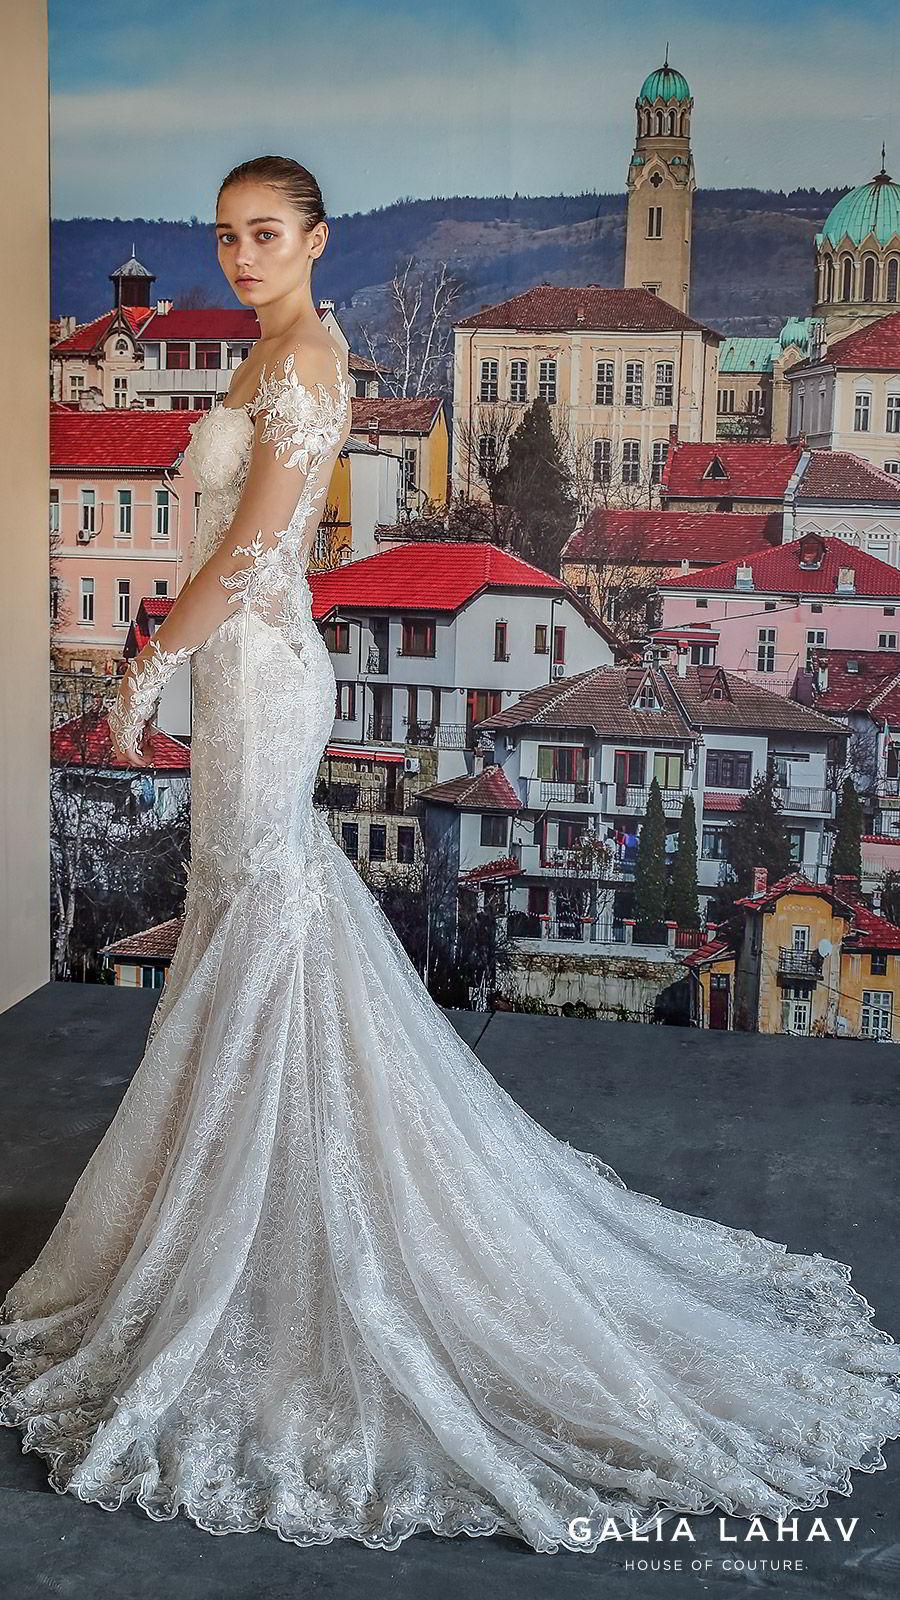 galia lahav fall 2019 bridal illusion long sleeves sweetheart neckline fit flare heavily embellished mermaid lace wedding dress chapel train elegant romantic (nissa) sv